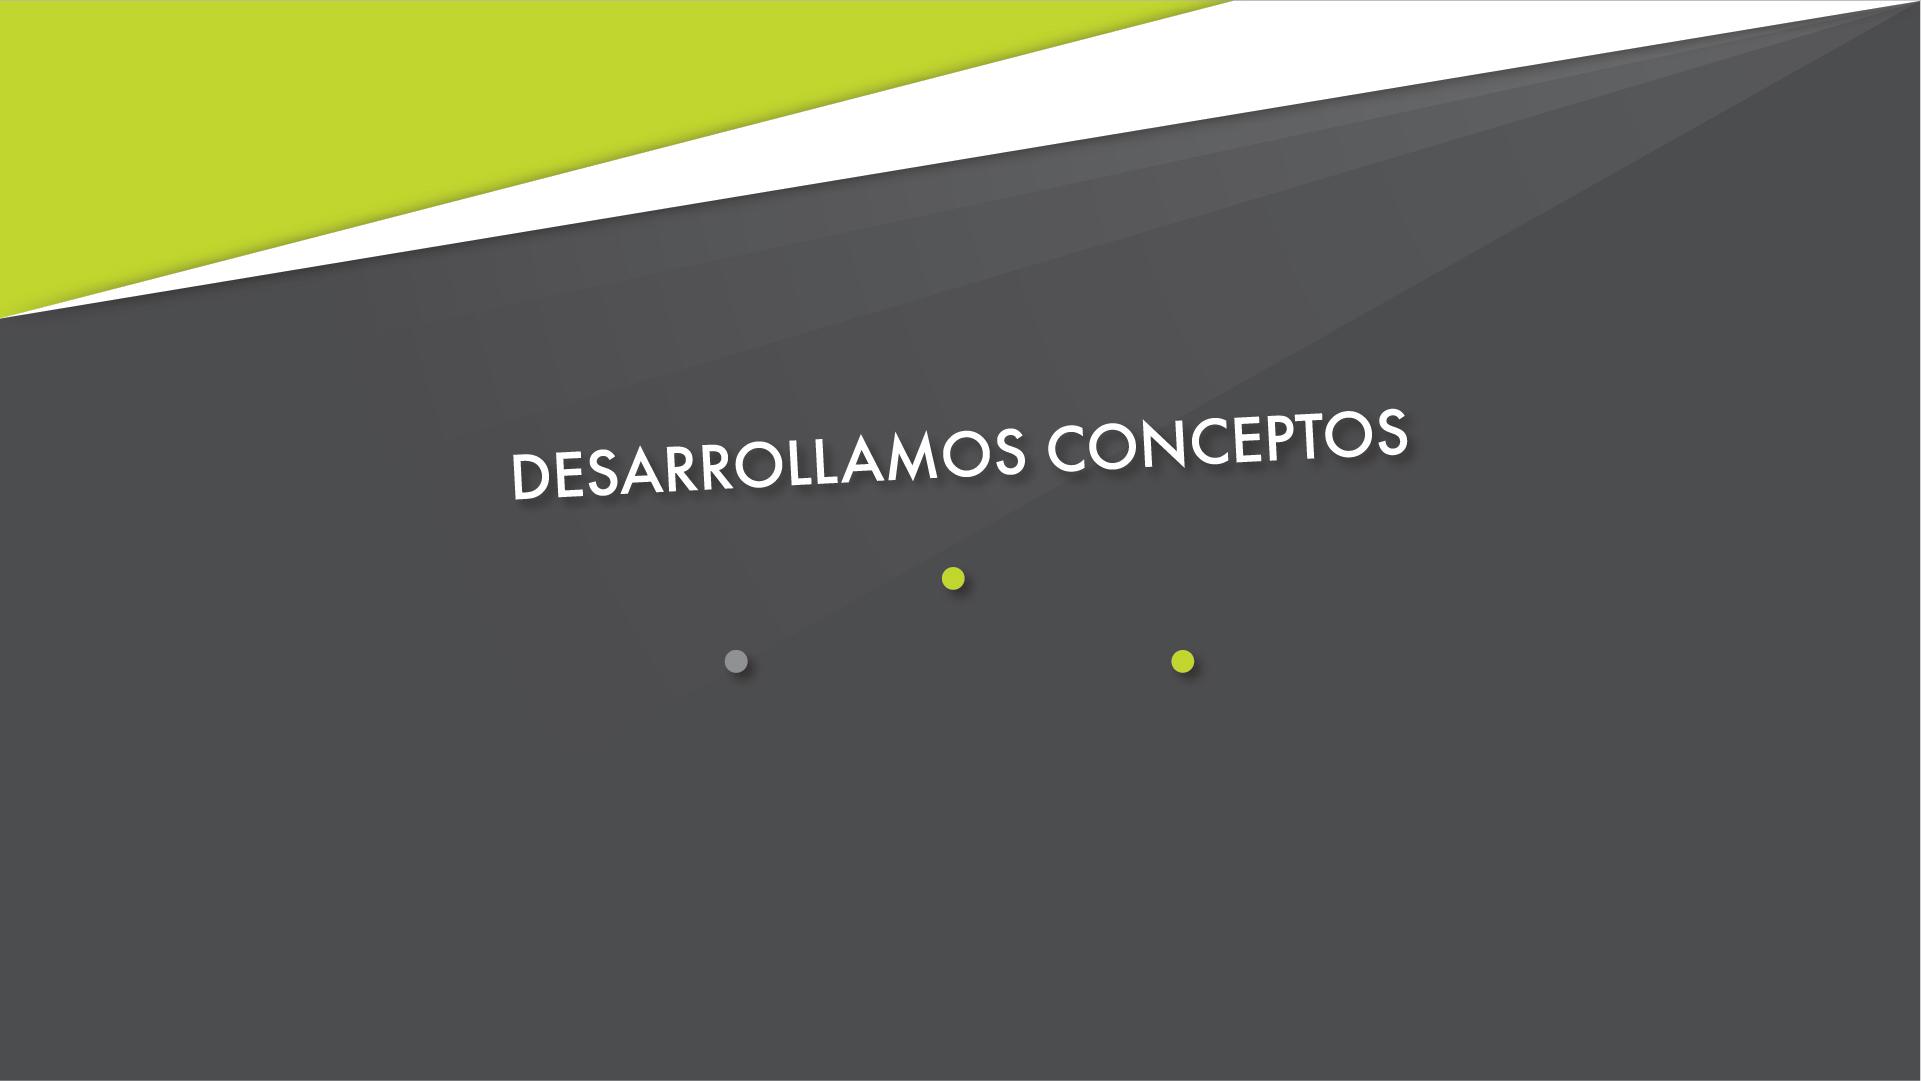 fondo_desarrollamos_3qp_5